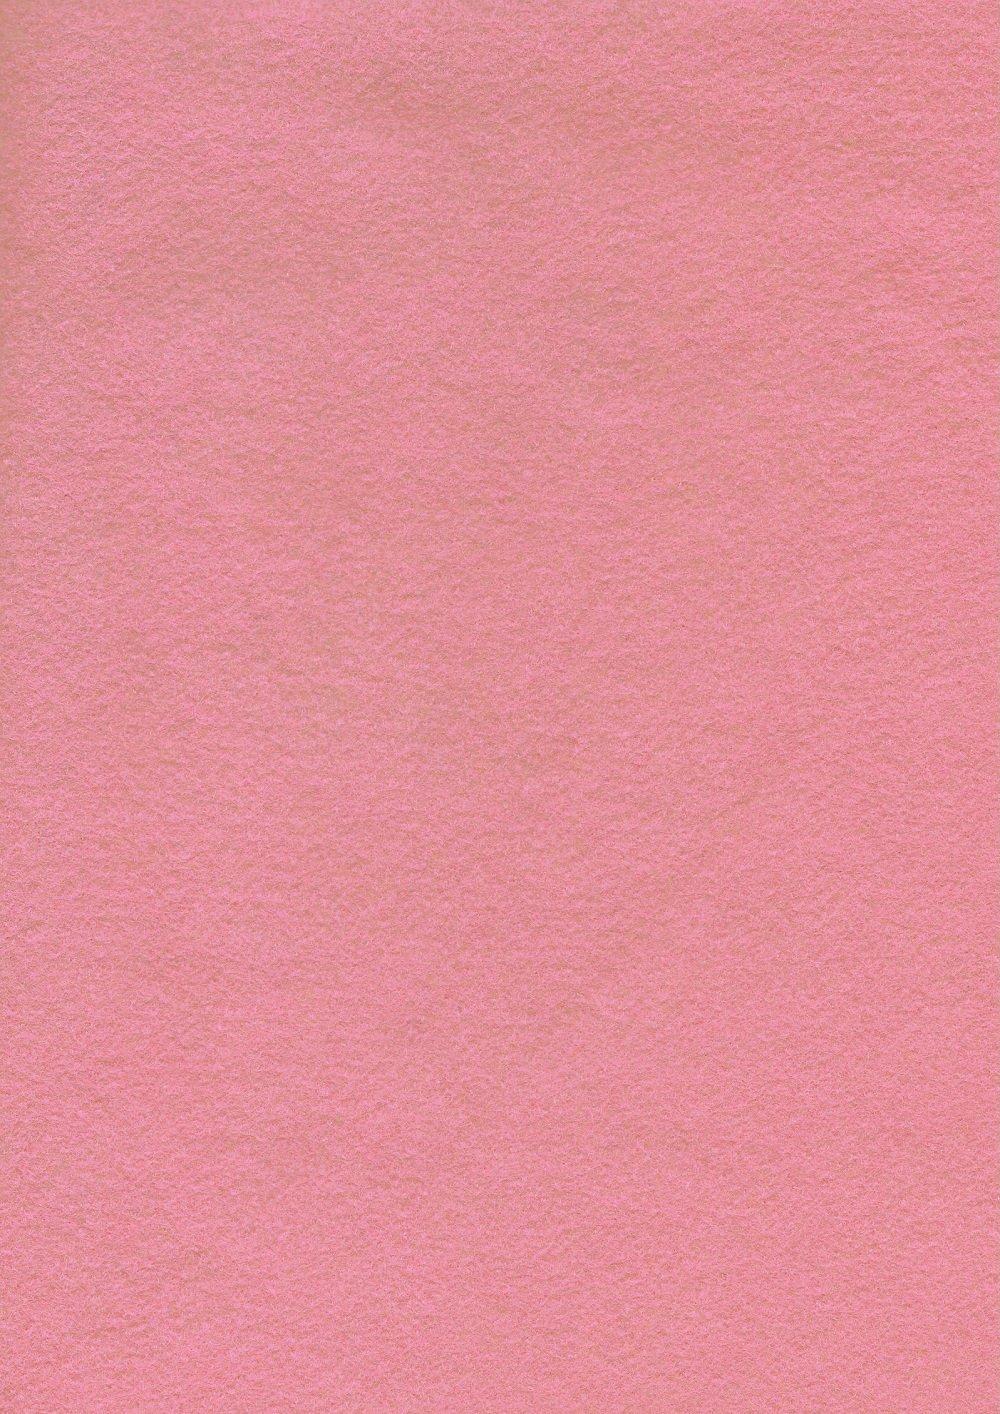 Cotton Candy - 12 x 18 Square